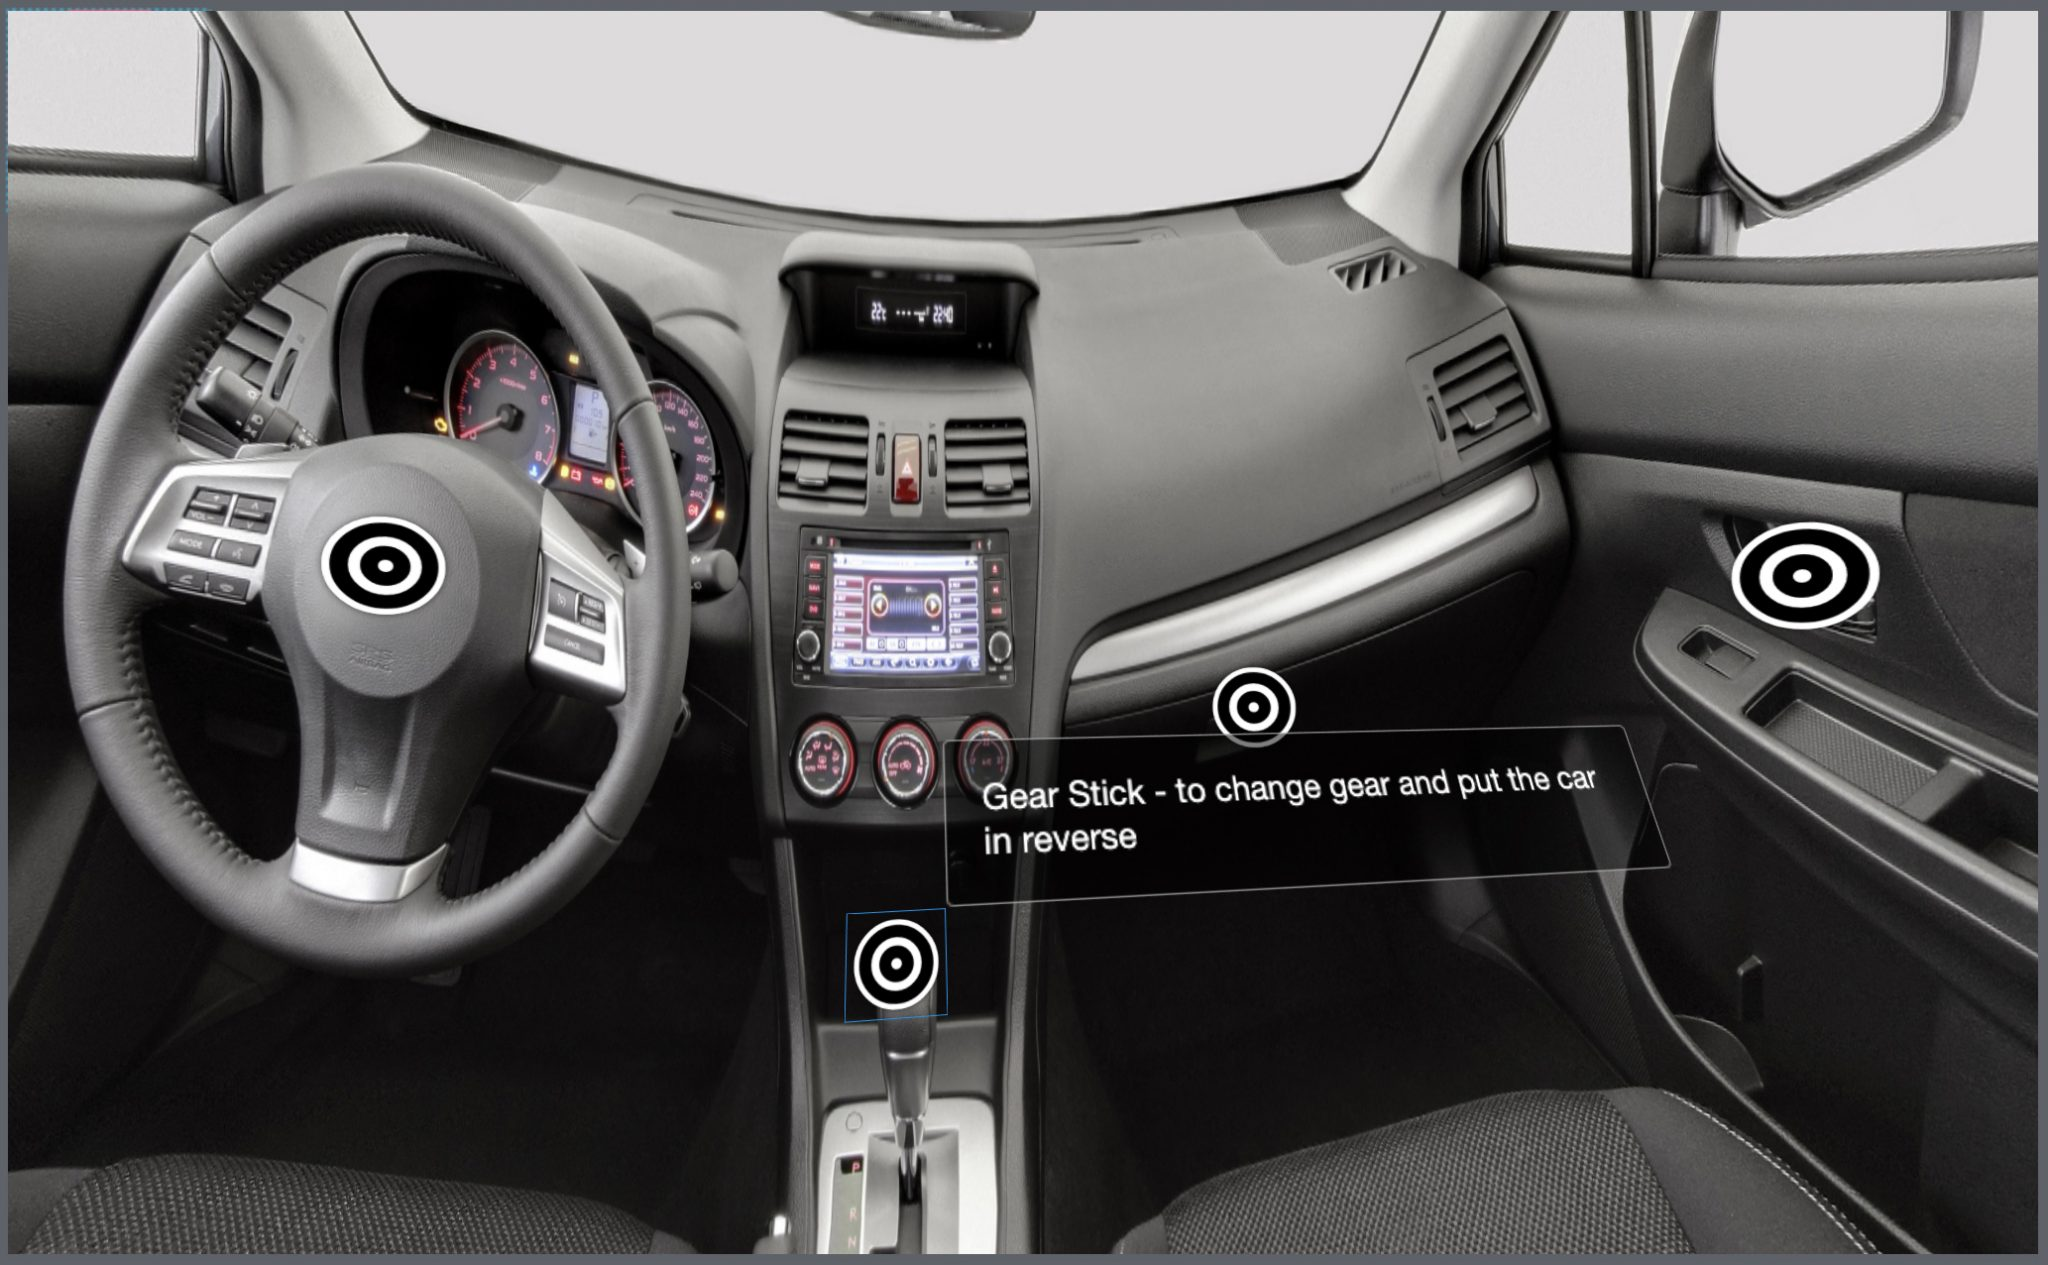 Adobe Captivate VR experience